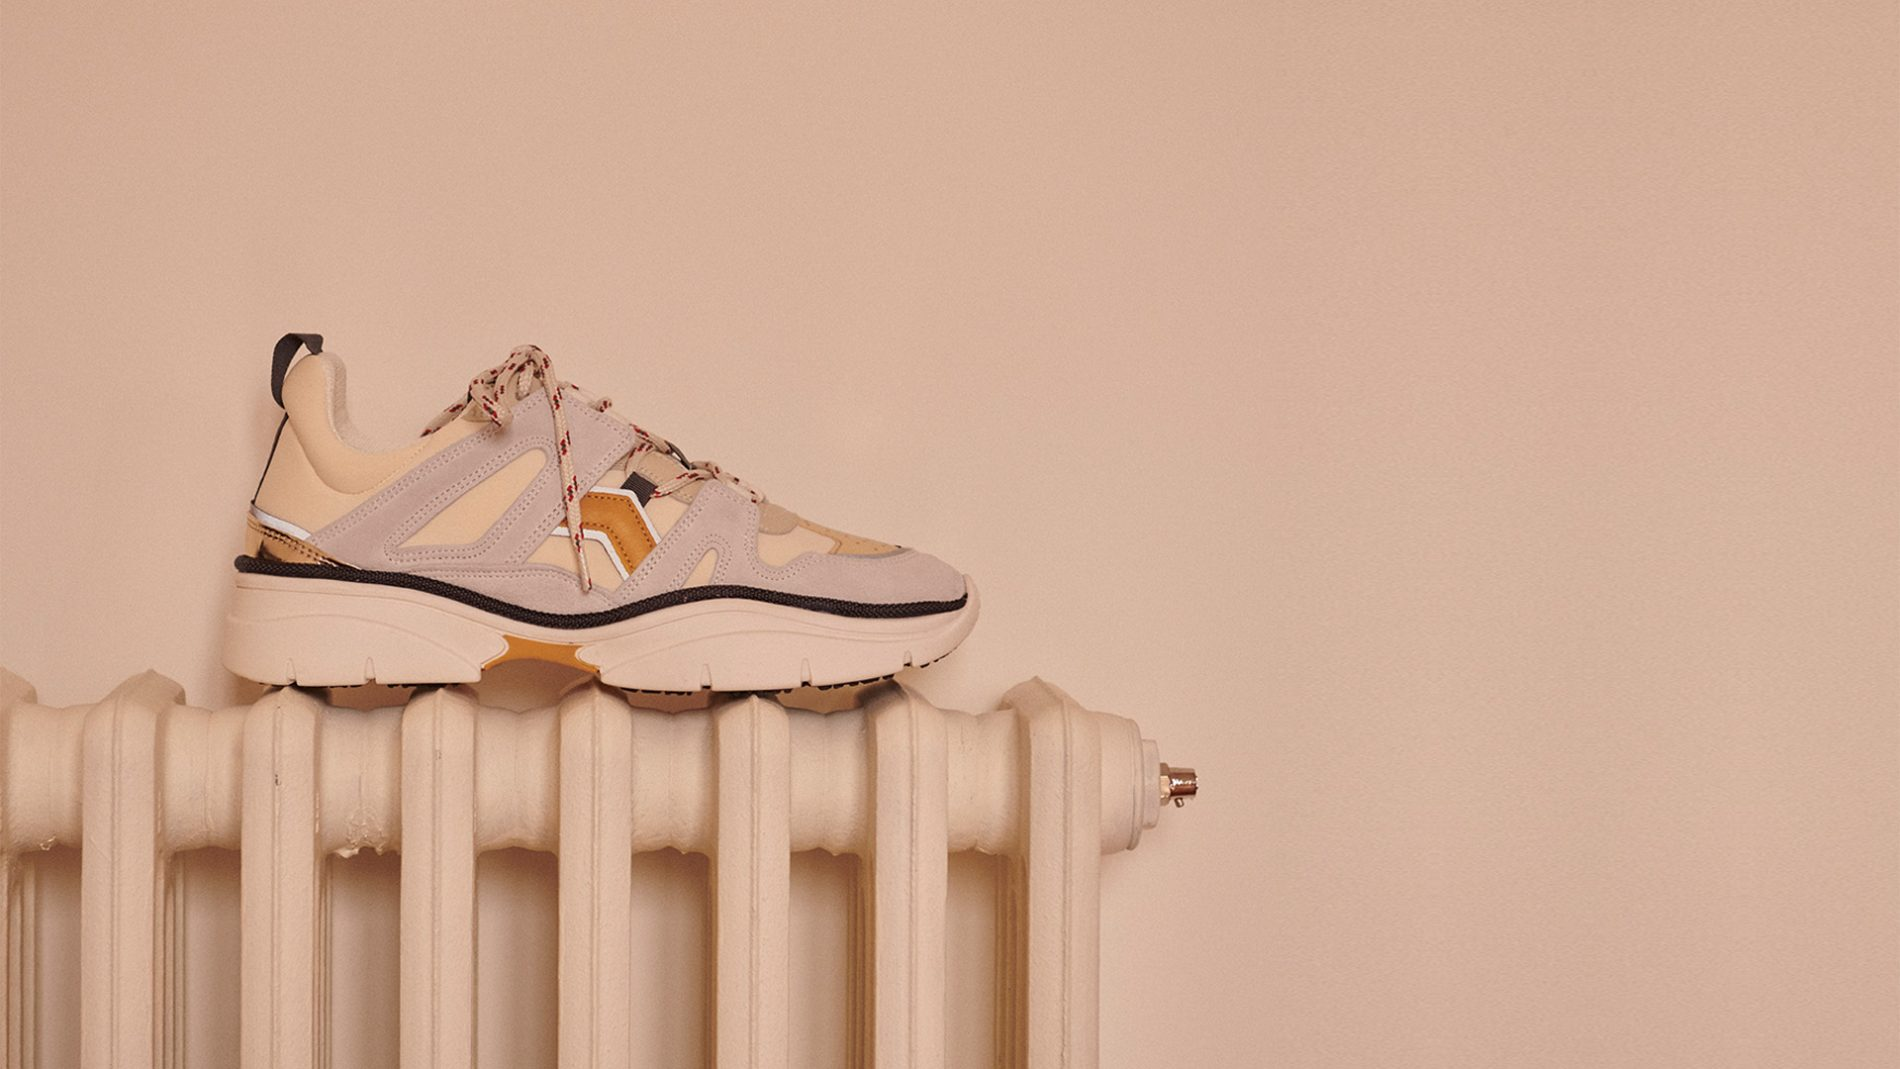 El Corte Inglés Designer Shoes Sneakers Isabel Marant